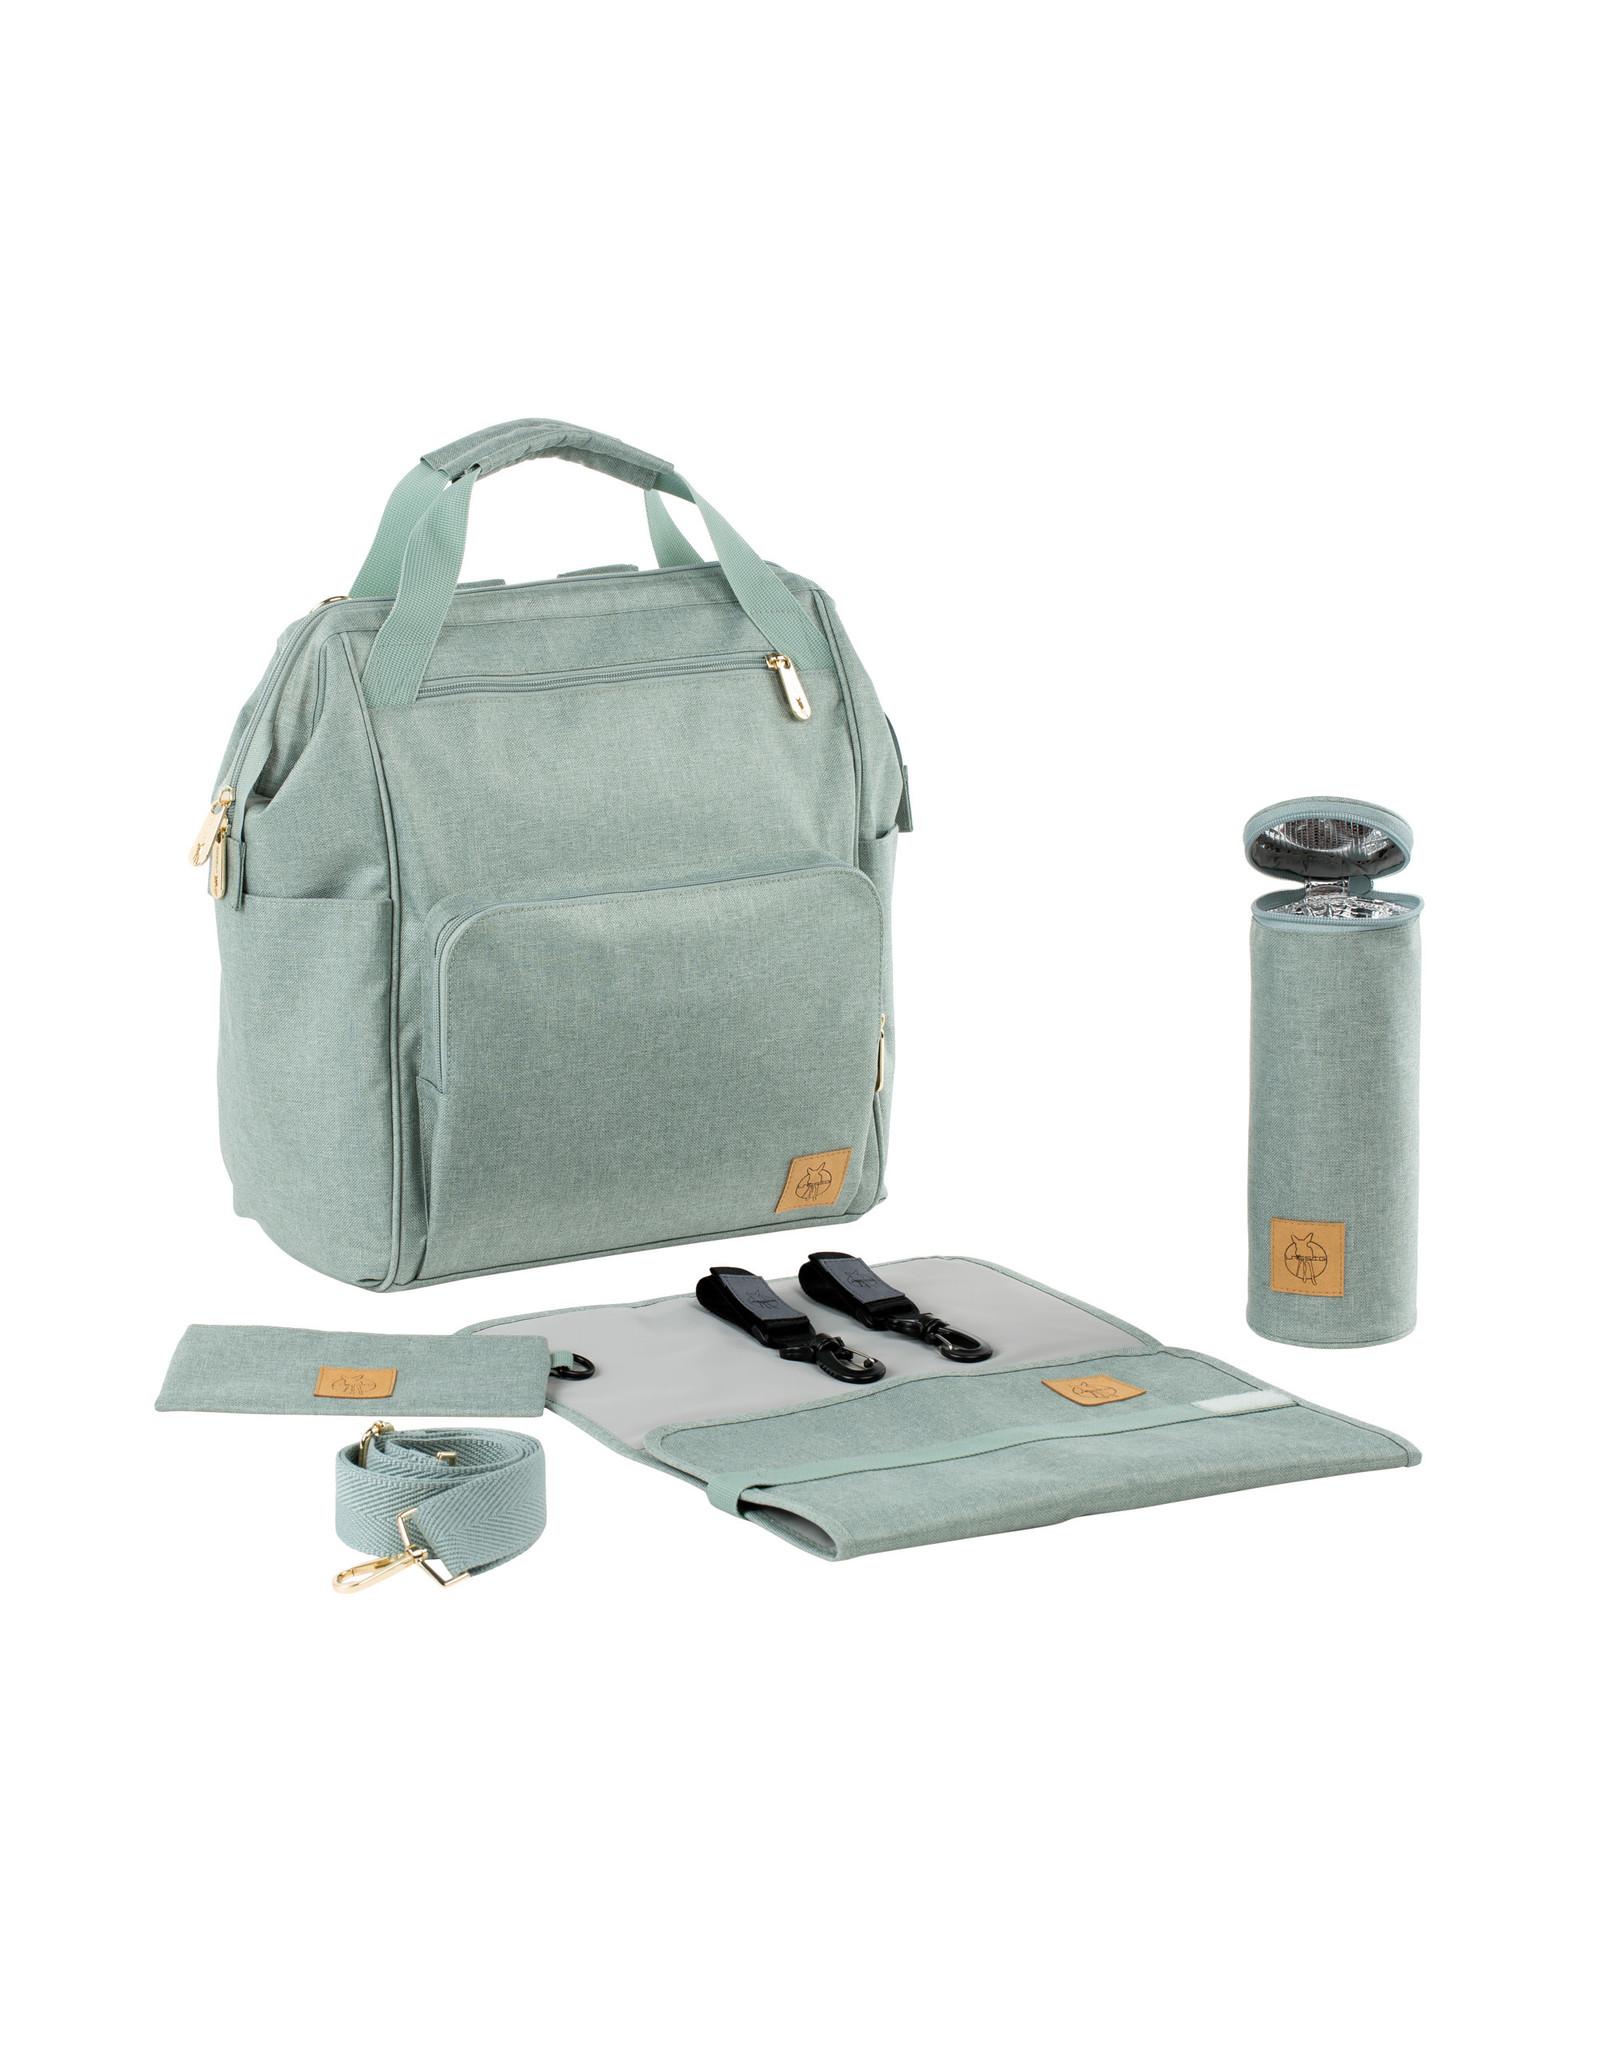 Lassig Lassig Glam Goldie Backpack Mint